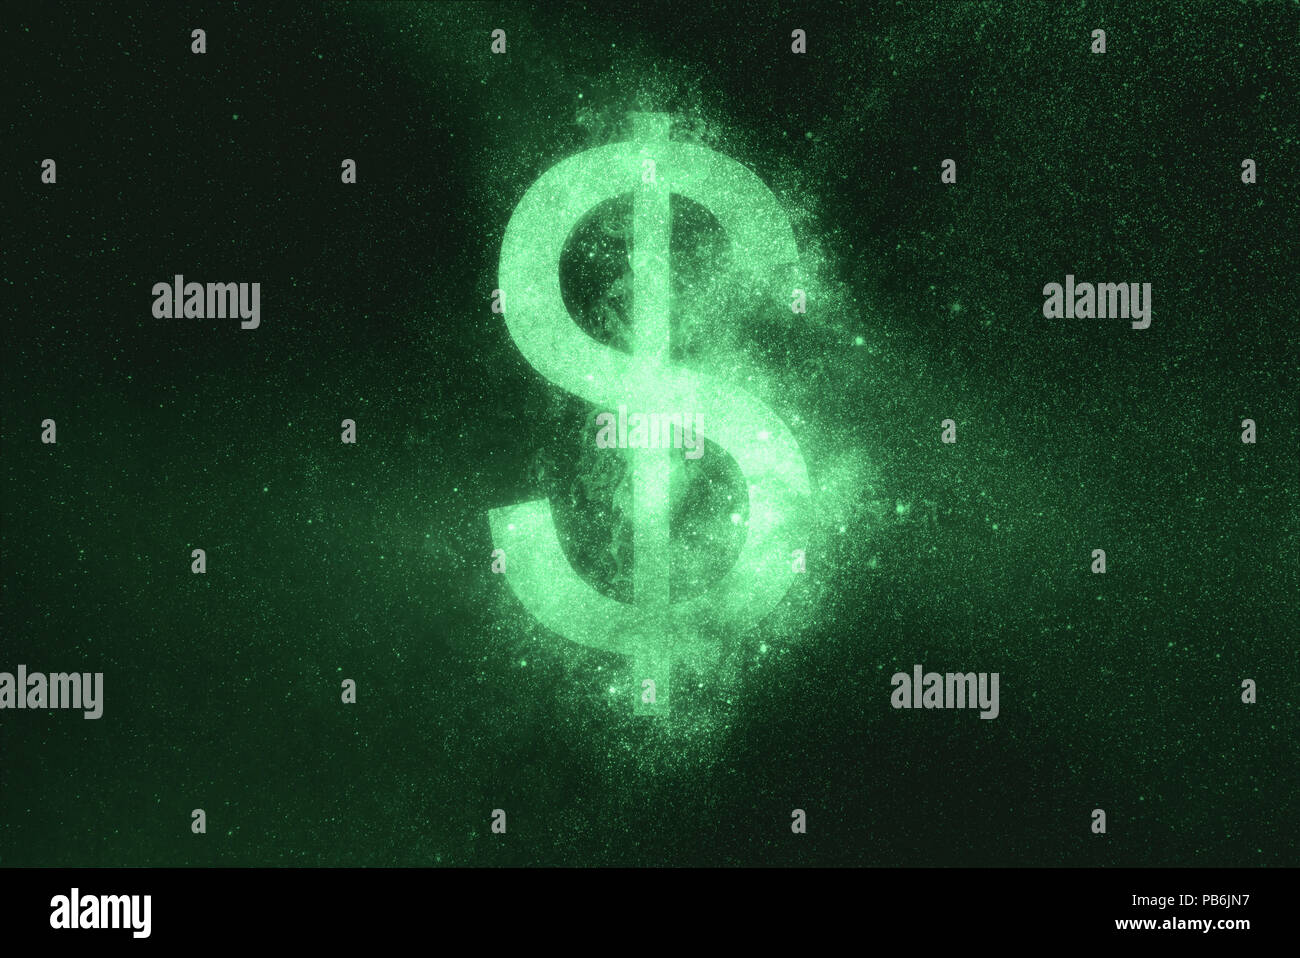 Dollarzeichen, Dollar, Symbol. Grünes Symbol. Stockbild